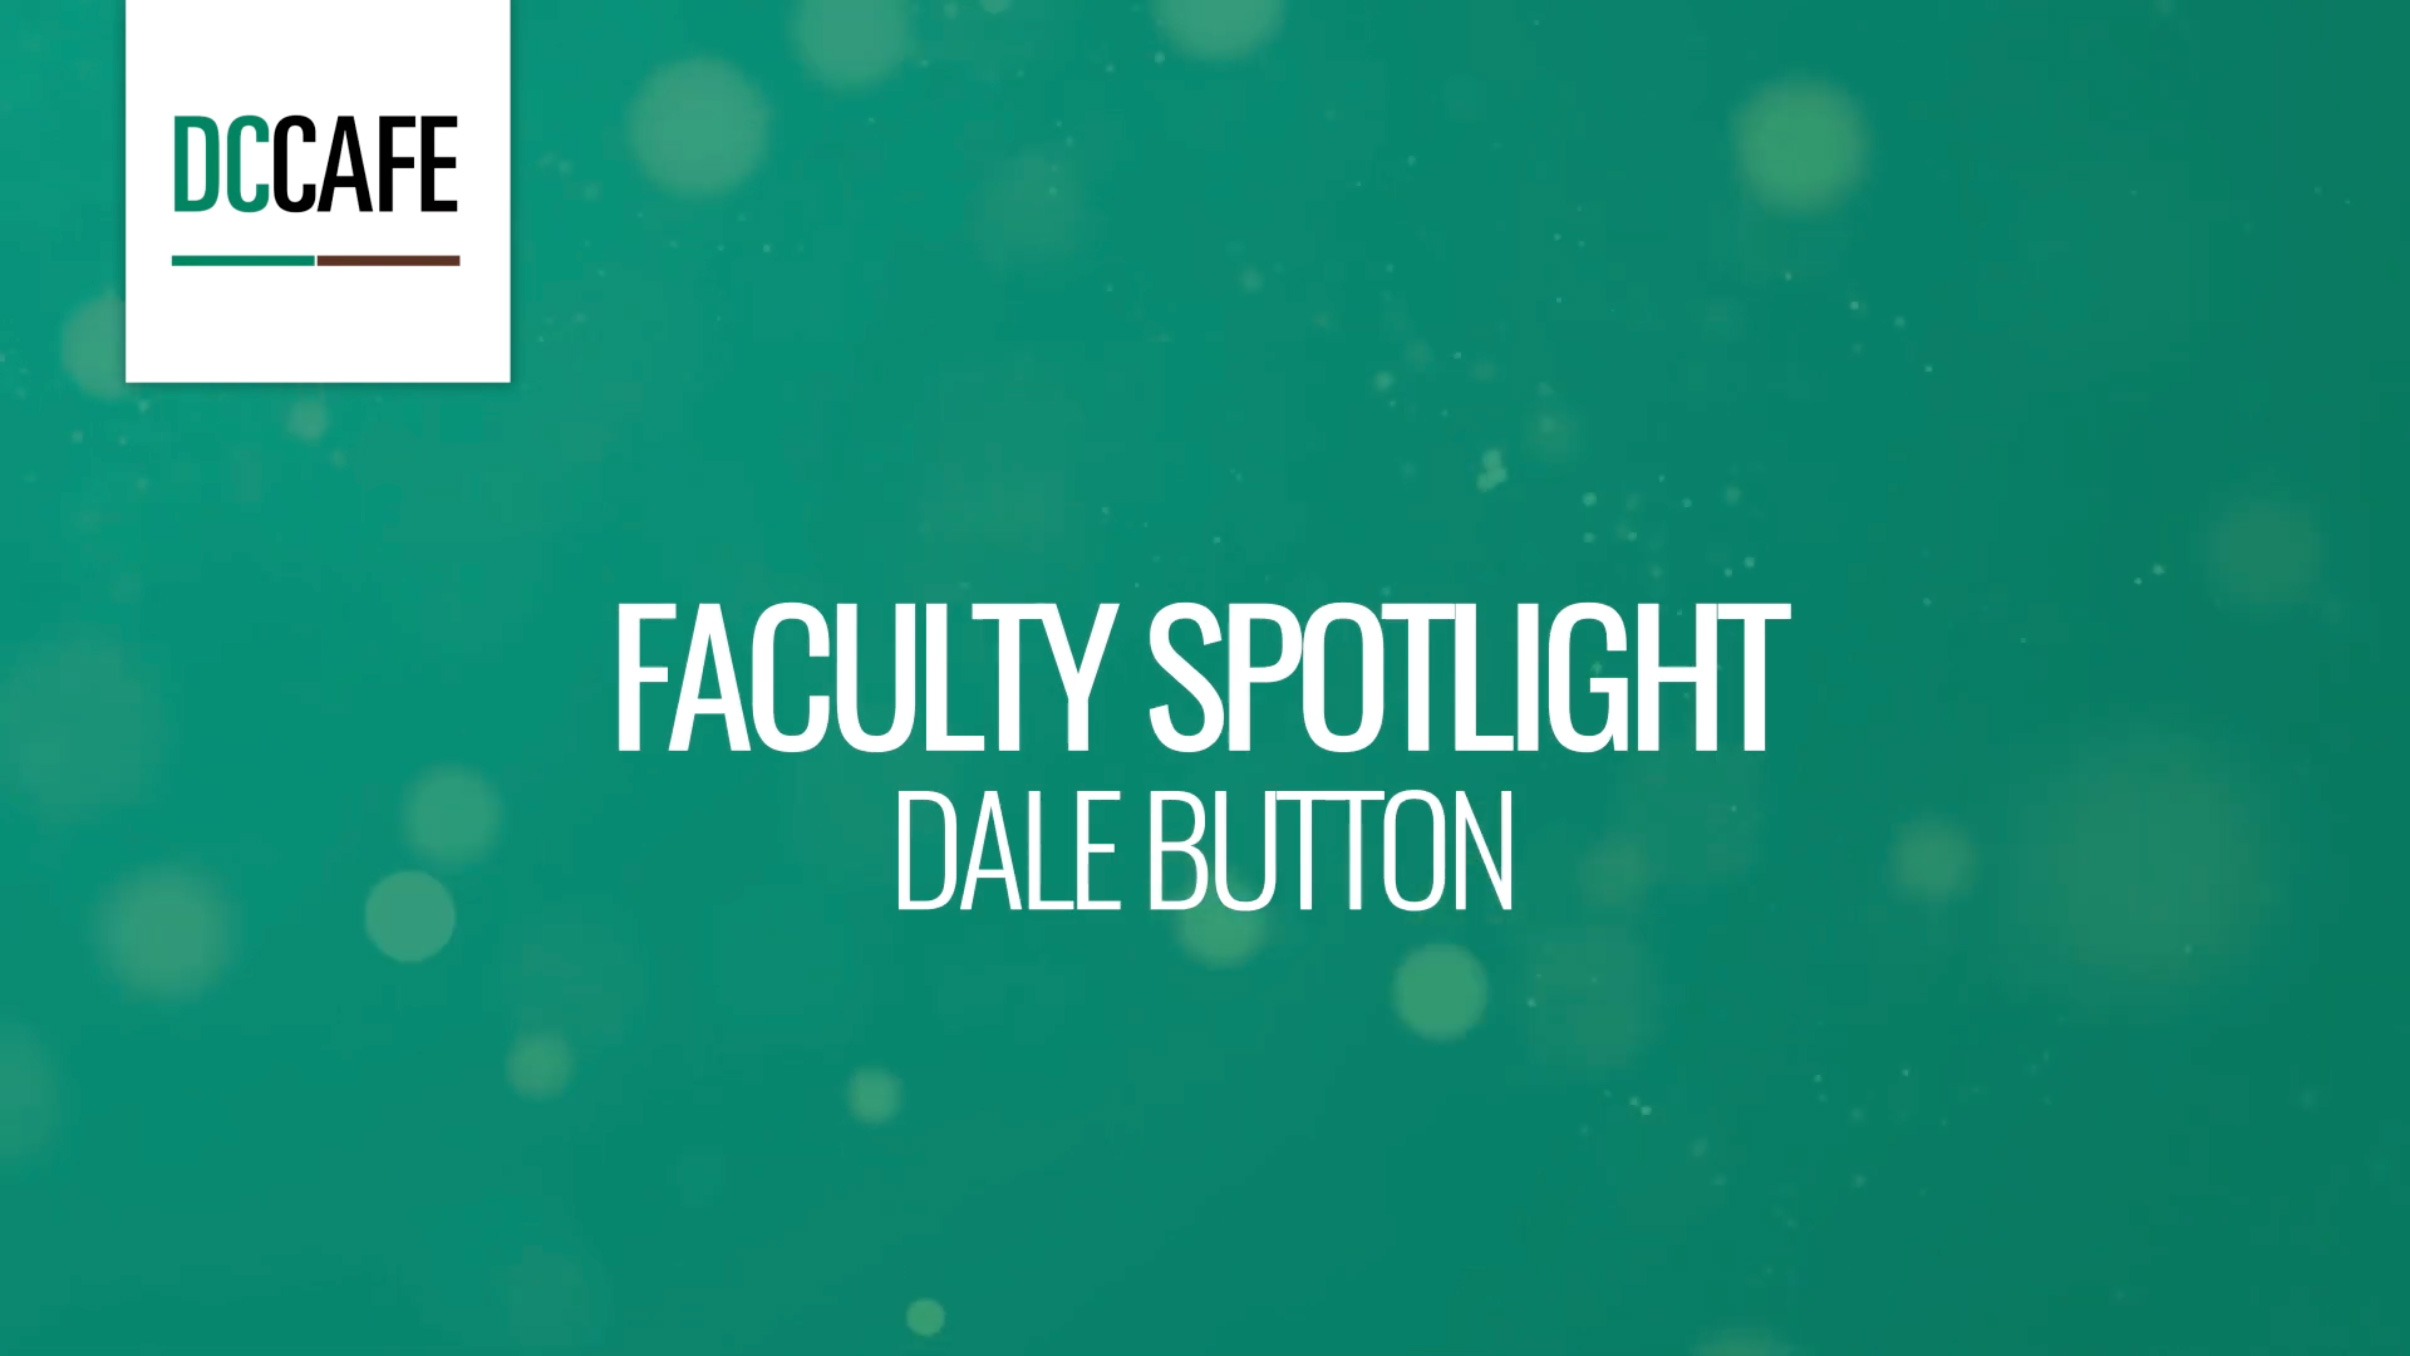 Faculty Spotlight - Dale Button